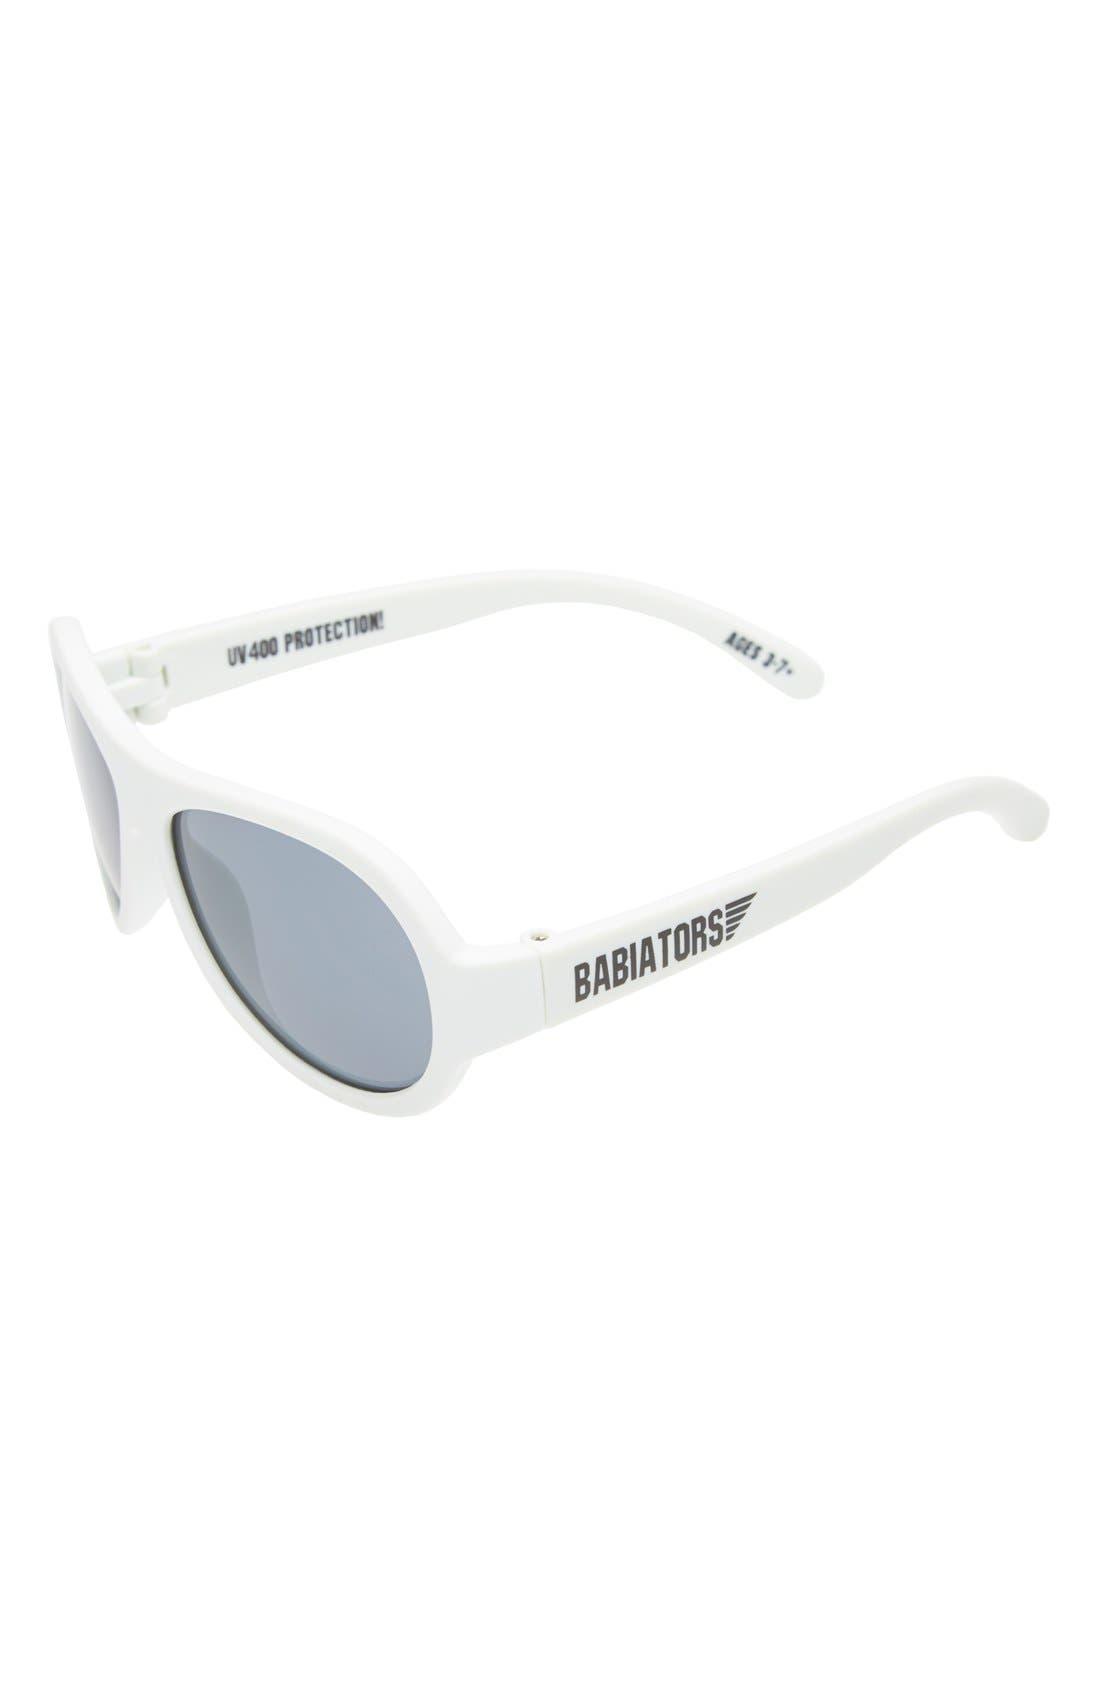 Alternate Image 1 Selected - Babiators 'Black Ops' Sunglasses (Little Kid)